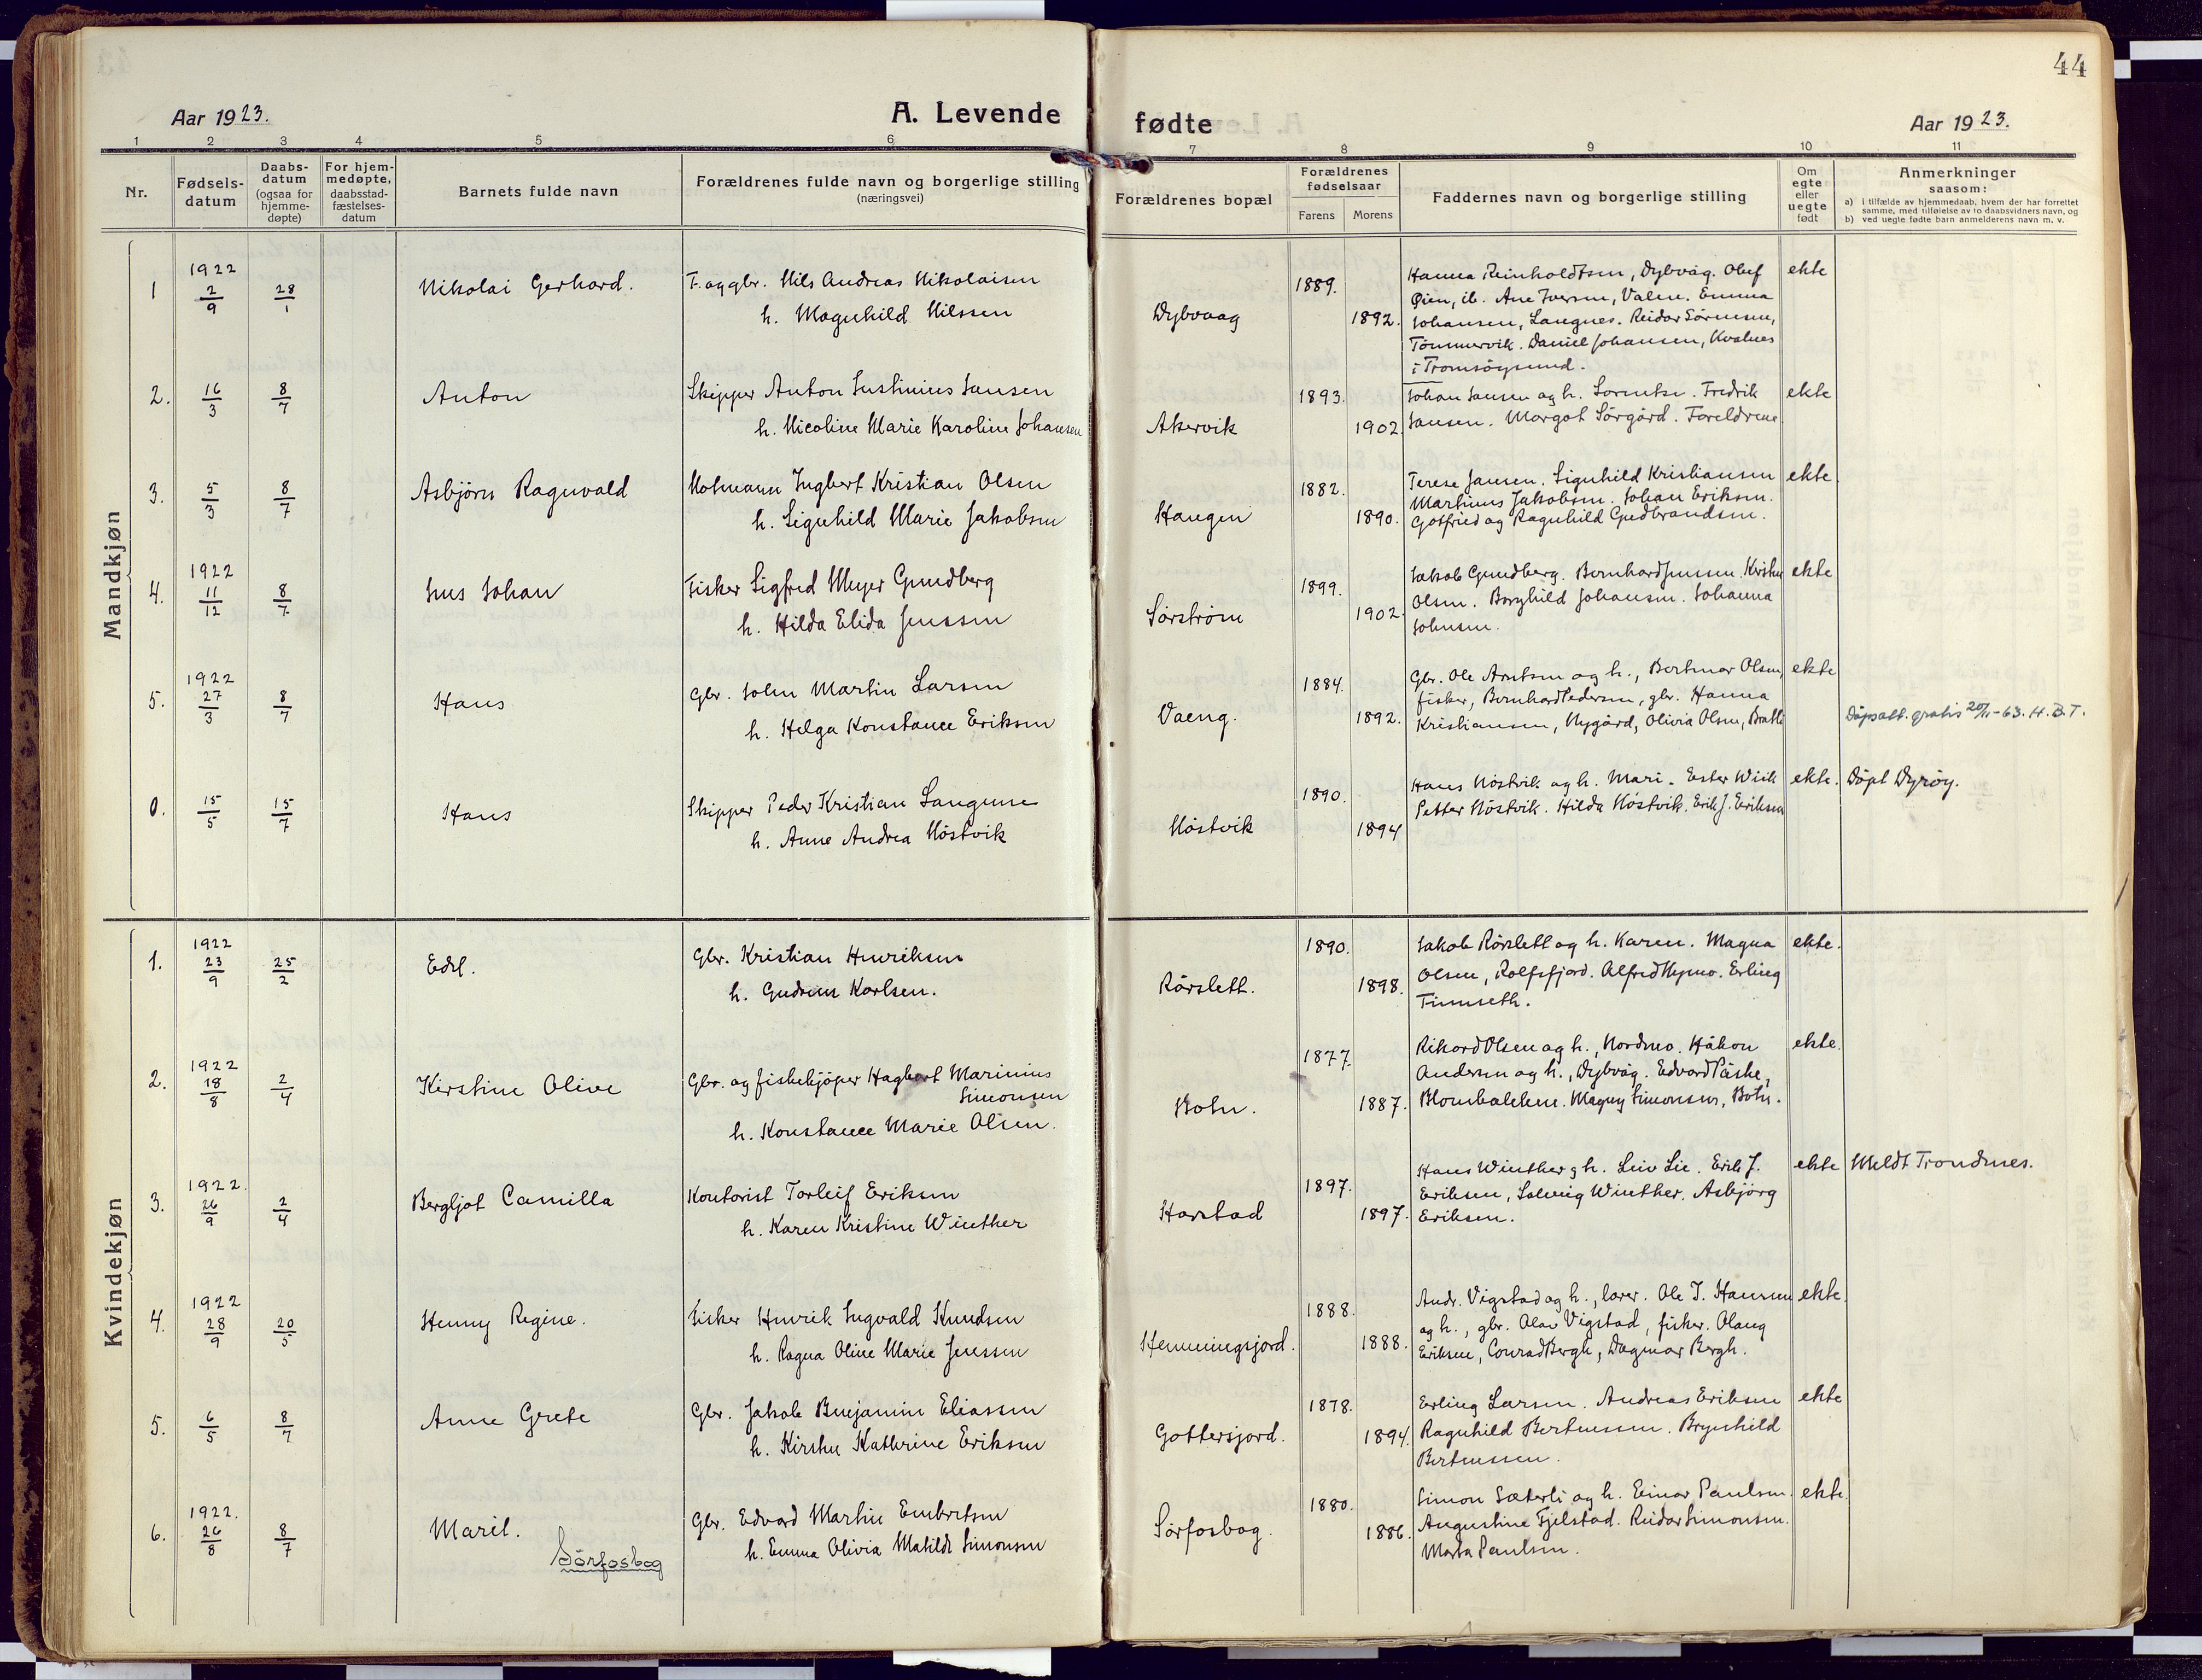 SATØ, Tranøy sokneprestkontor, I/Ia/Iaa/L0015kirke: Ministerialbok nr. 15, 1919-1928, s. 44